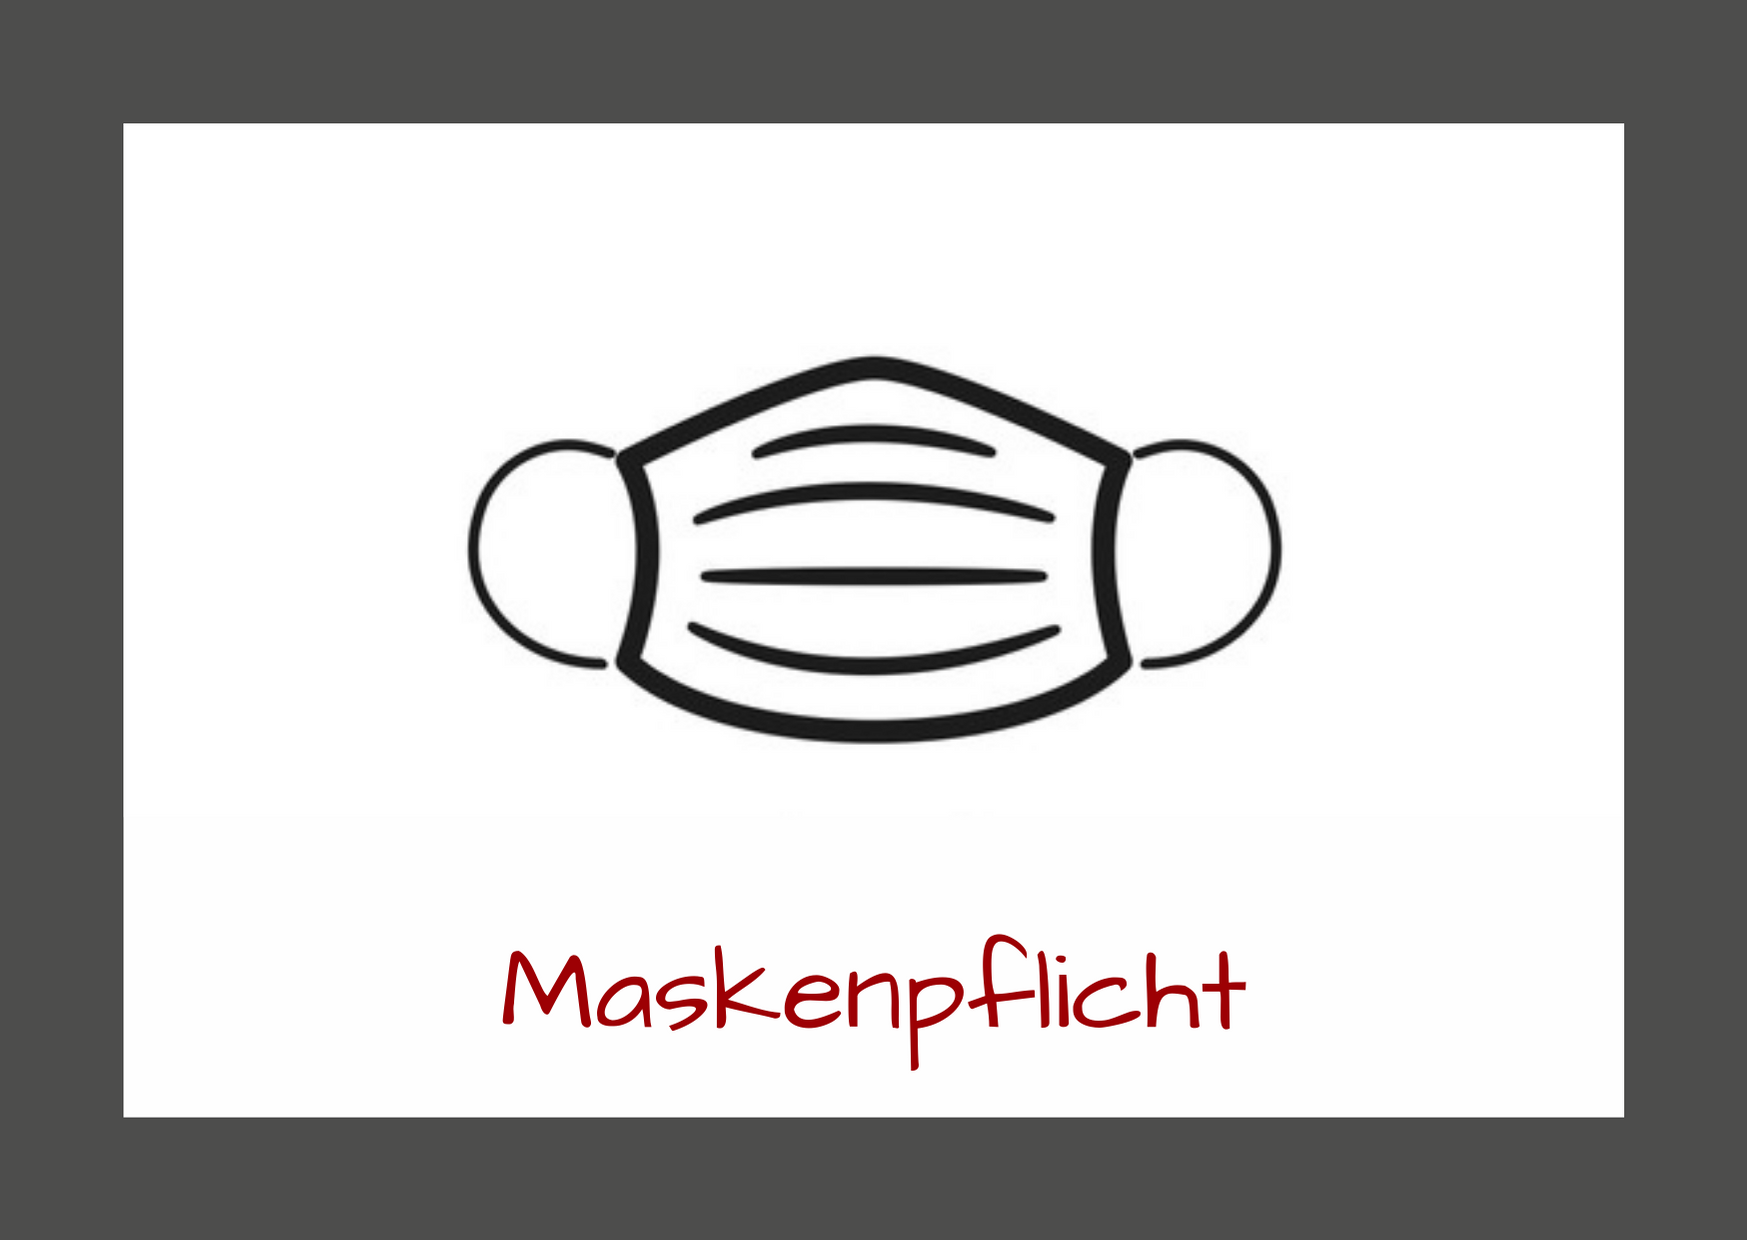 Maskenpflicht - Corona-Sicherheitsmaßnahmen